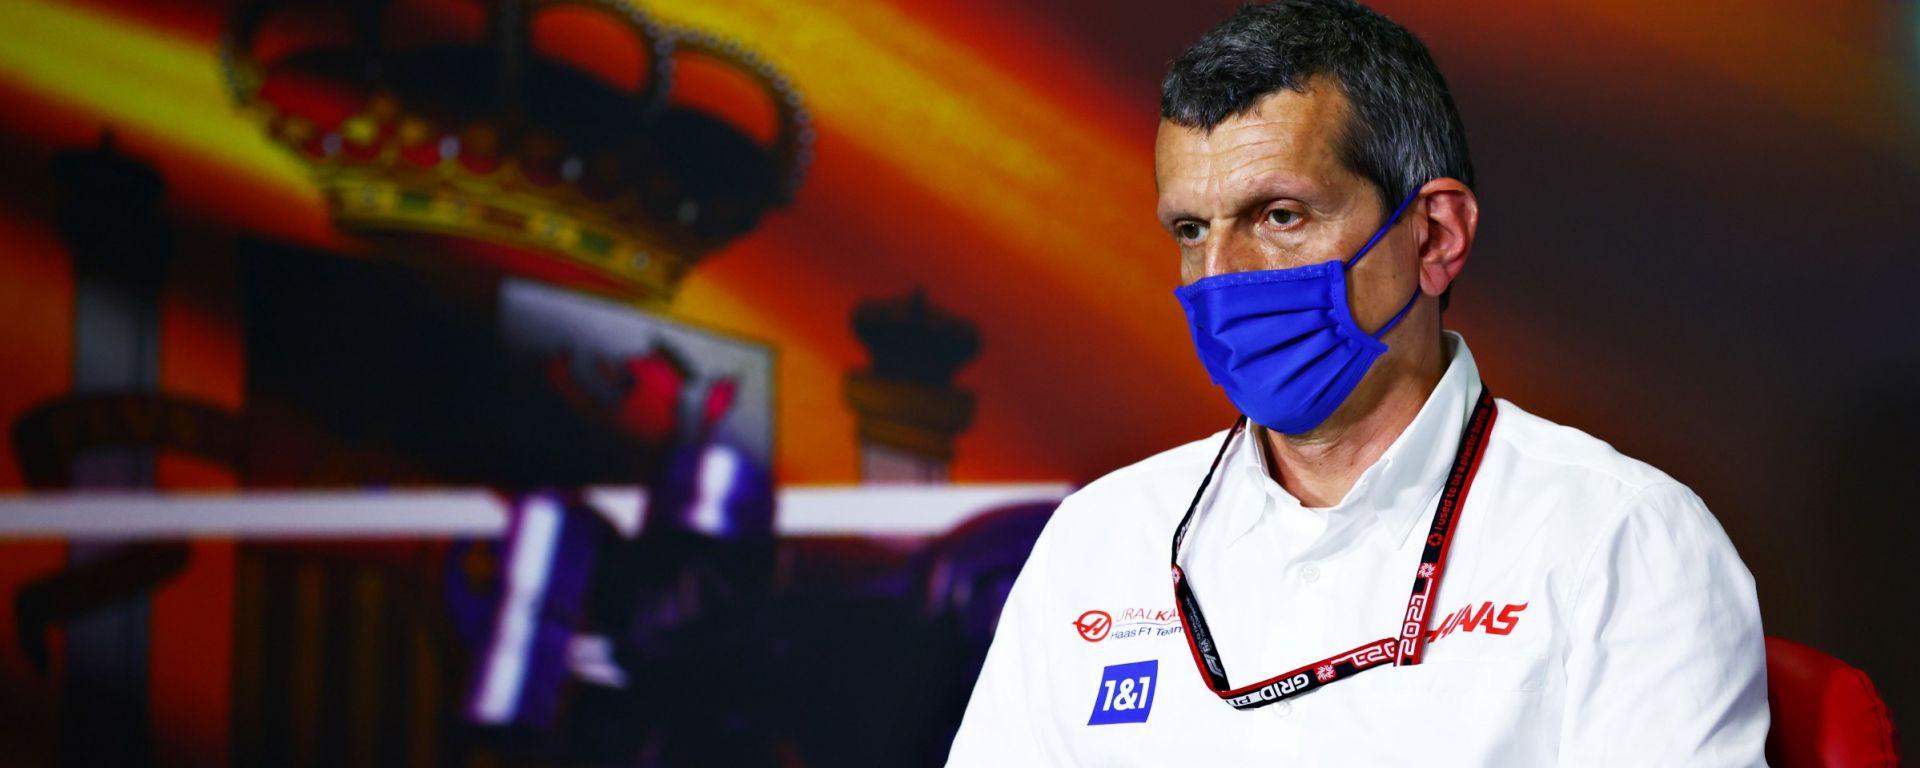 Haas, Steiner non esclude altre scintille tra Schumacher e Mazepin